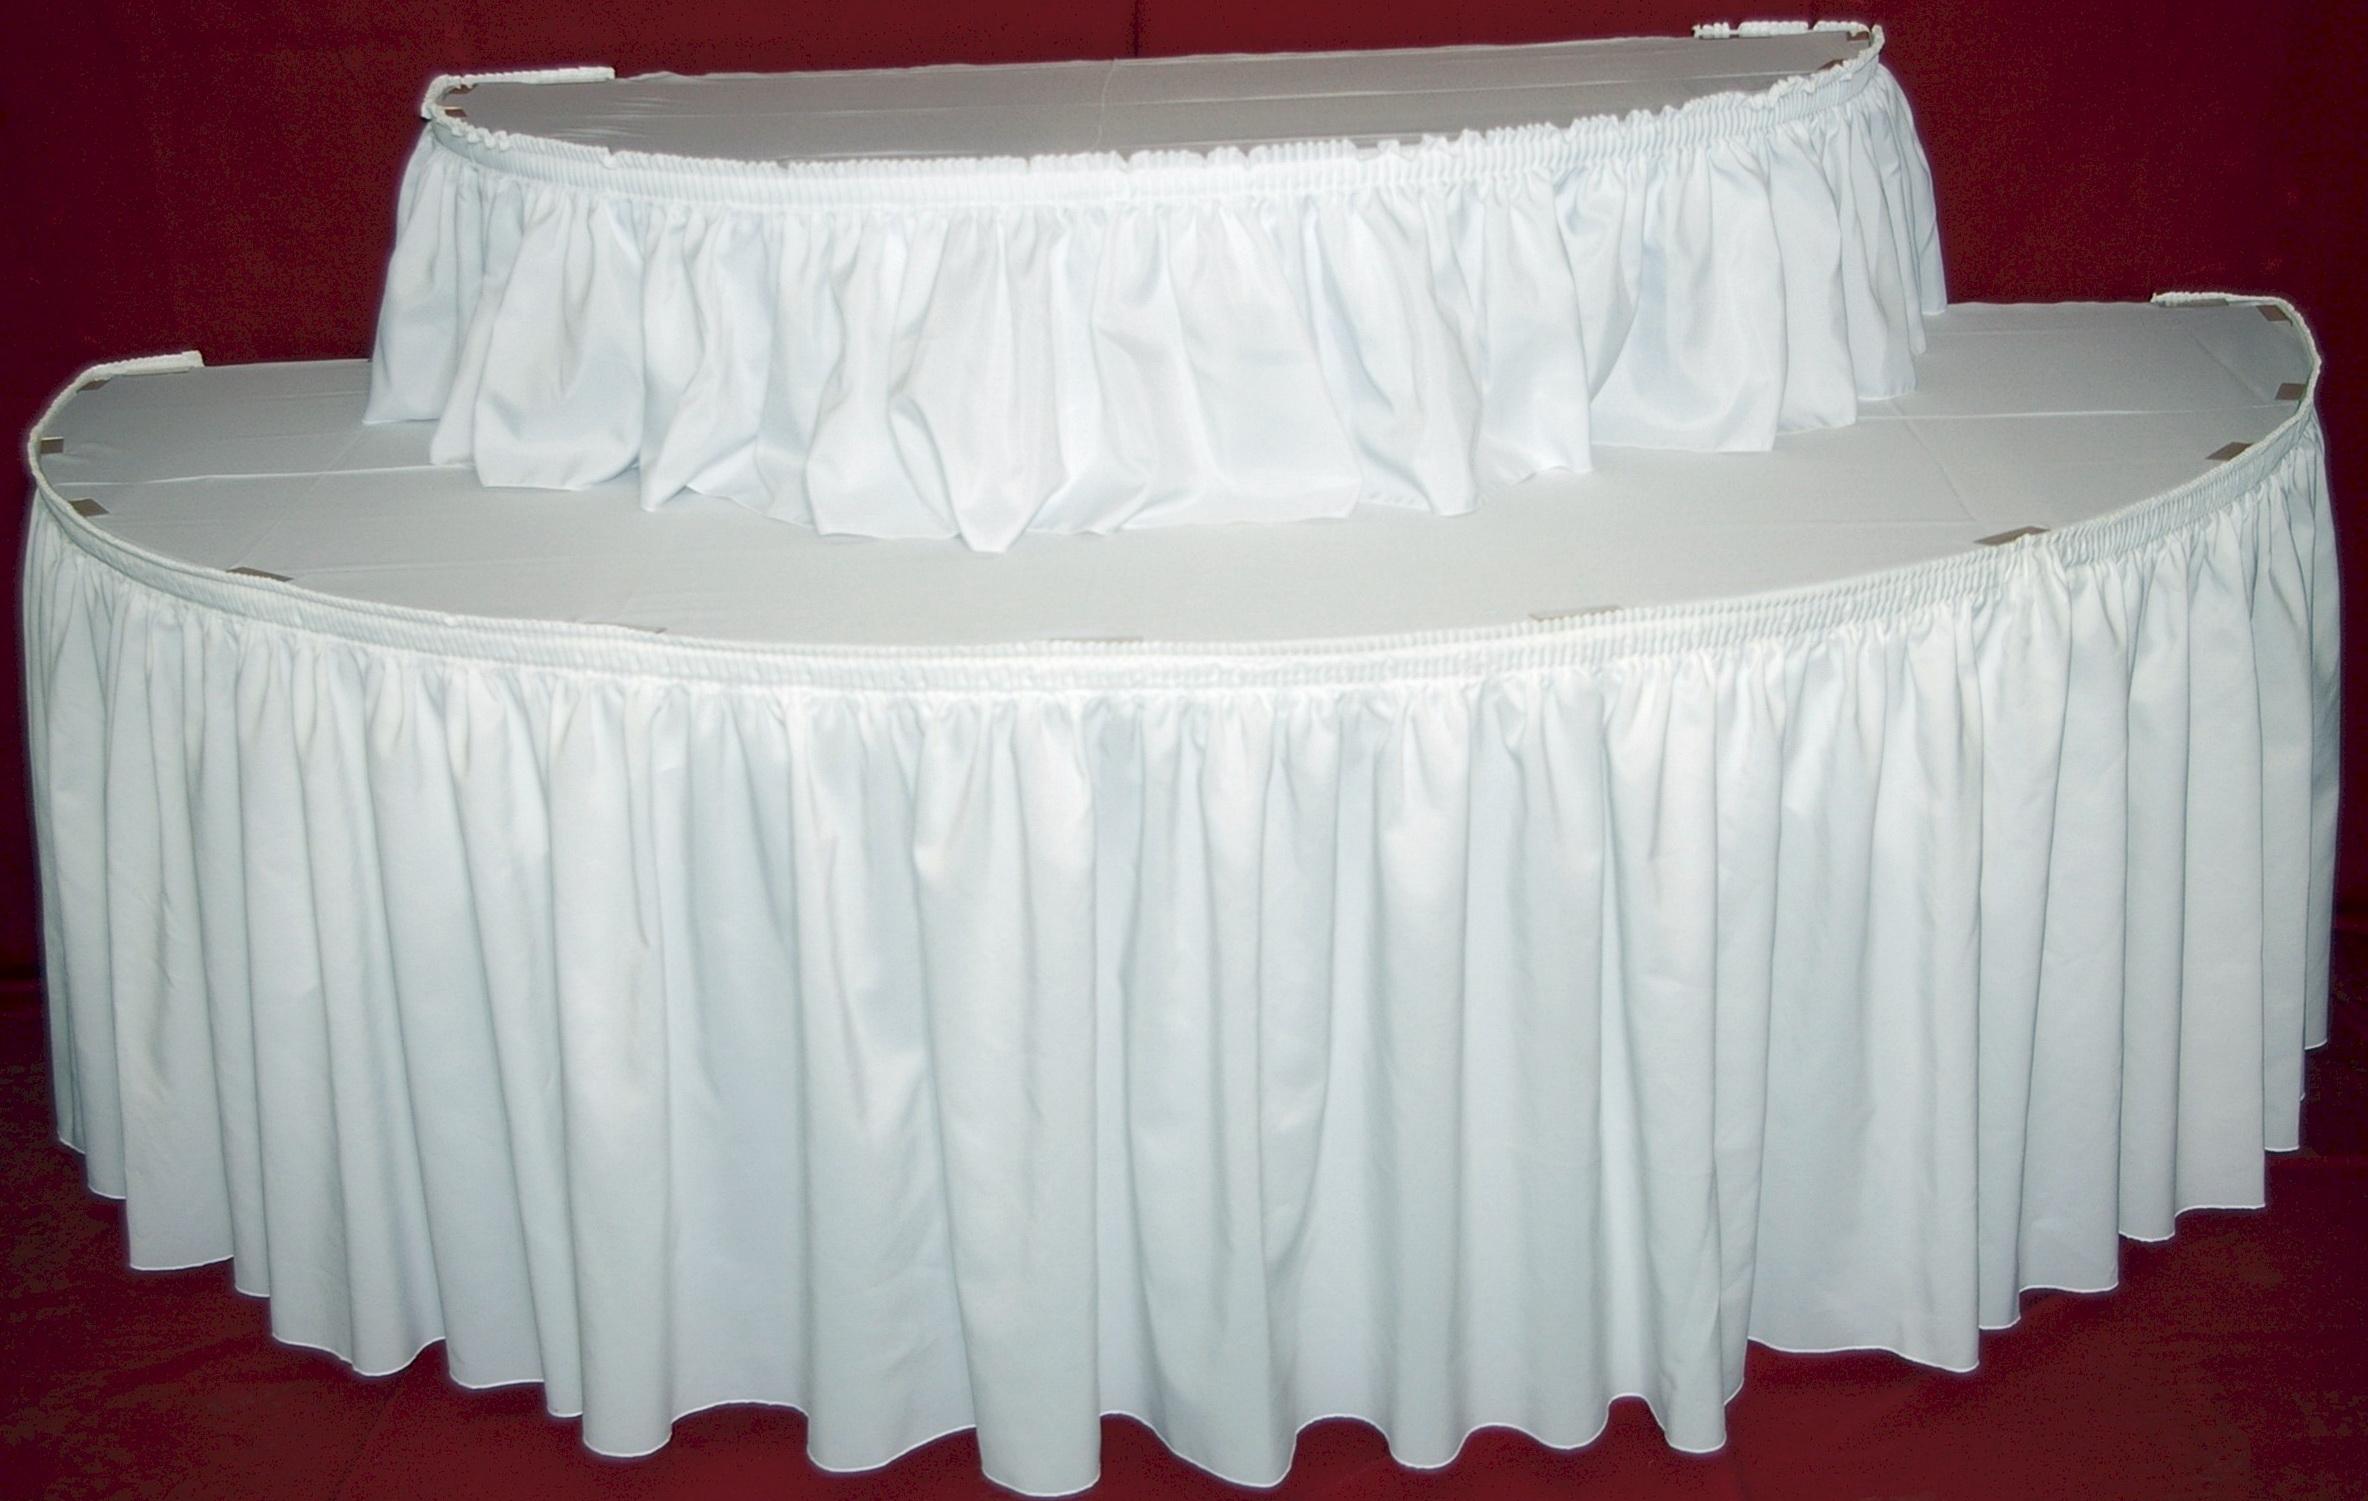 Cheap Table Linens Rentals